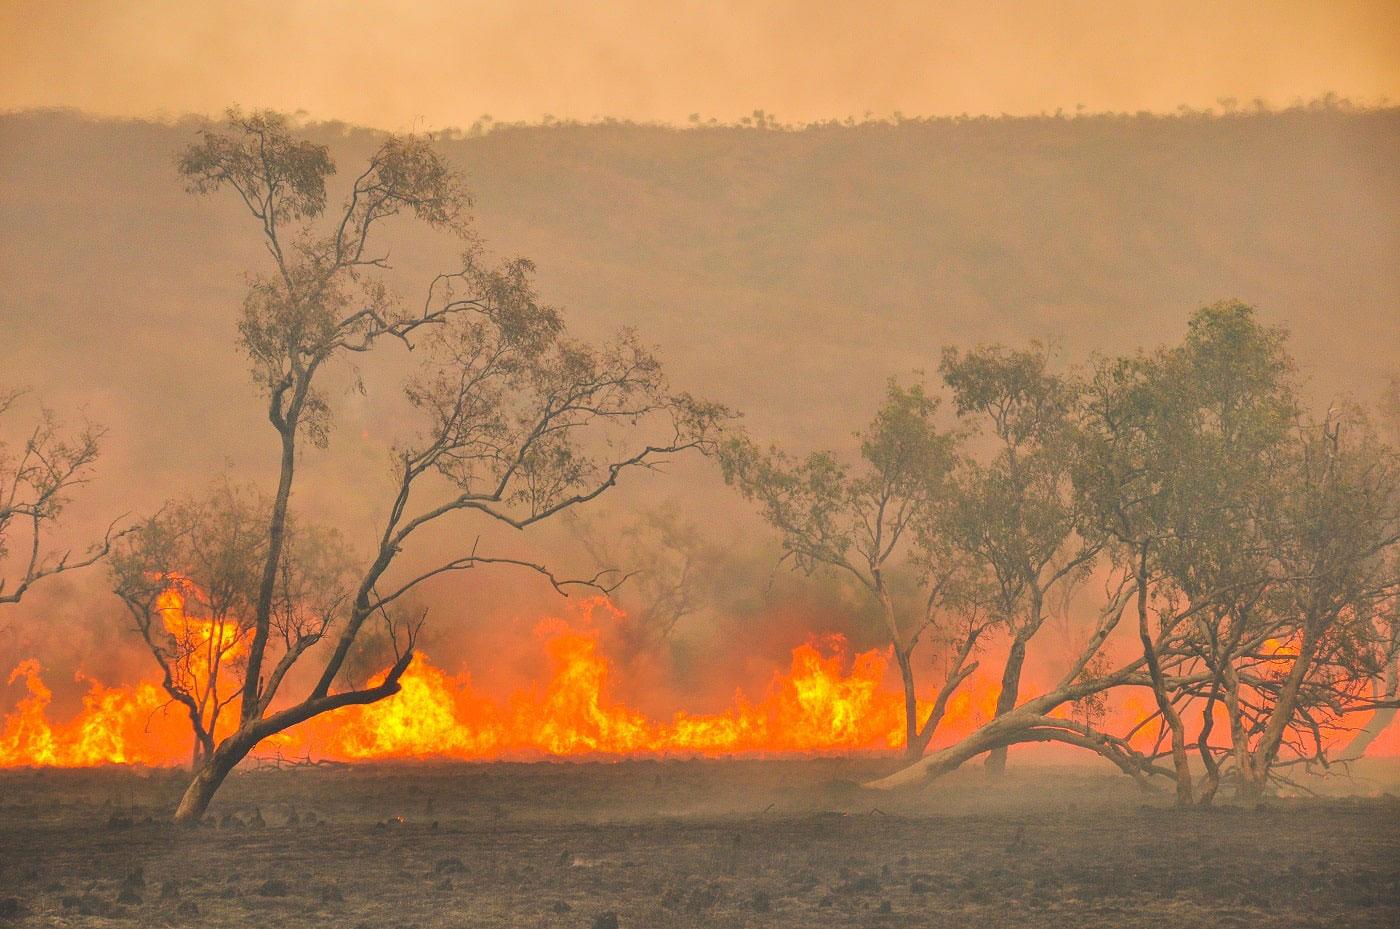 Brennende Landschaft bei dem Feuer in Australien